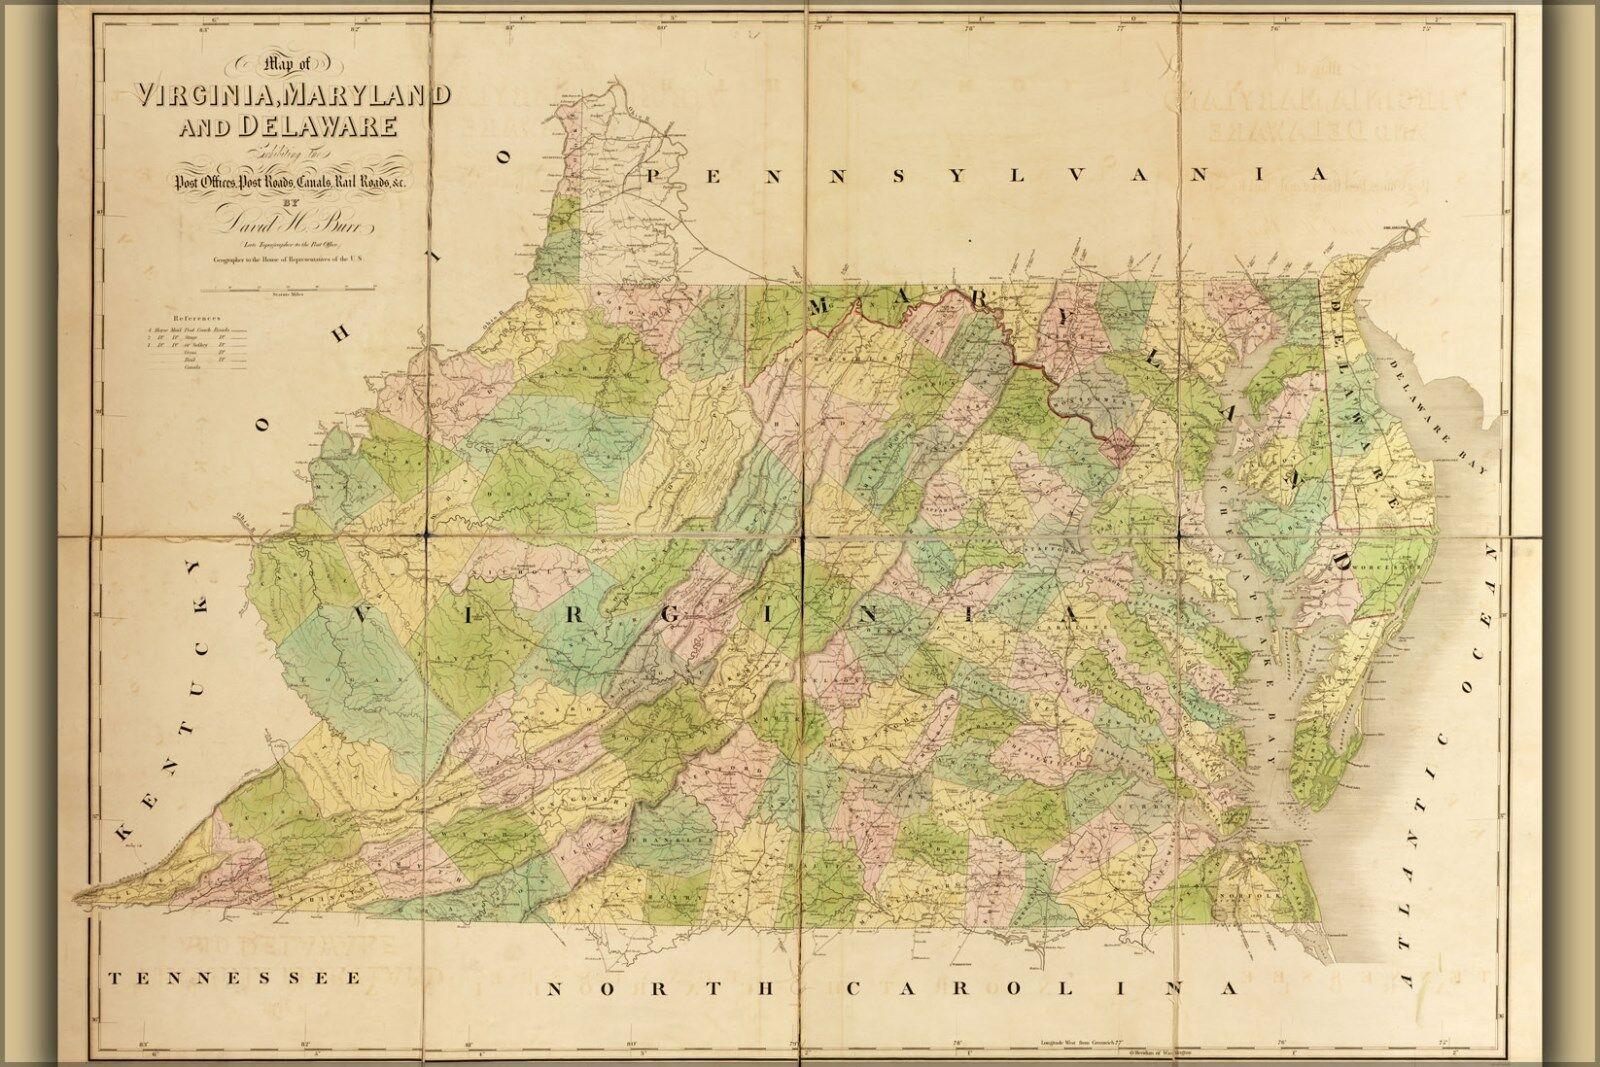 Poster, Many Größes; Map Of Virginia, Maryland, Delaware 1839